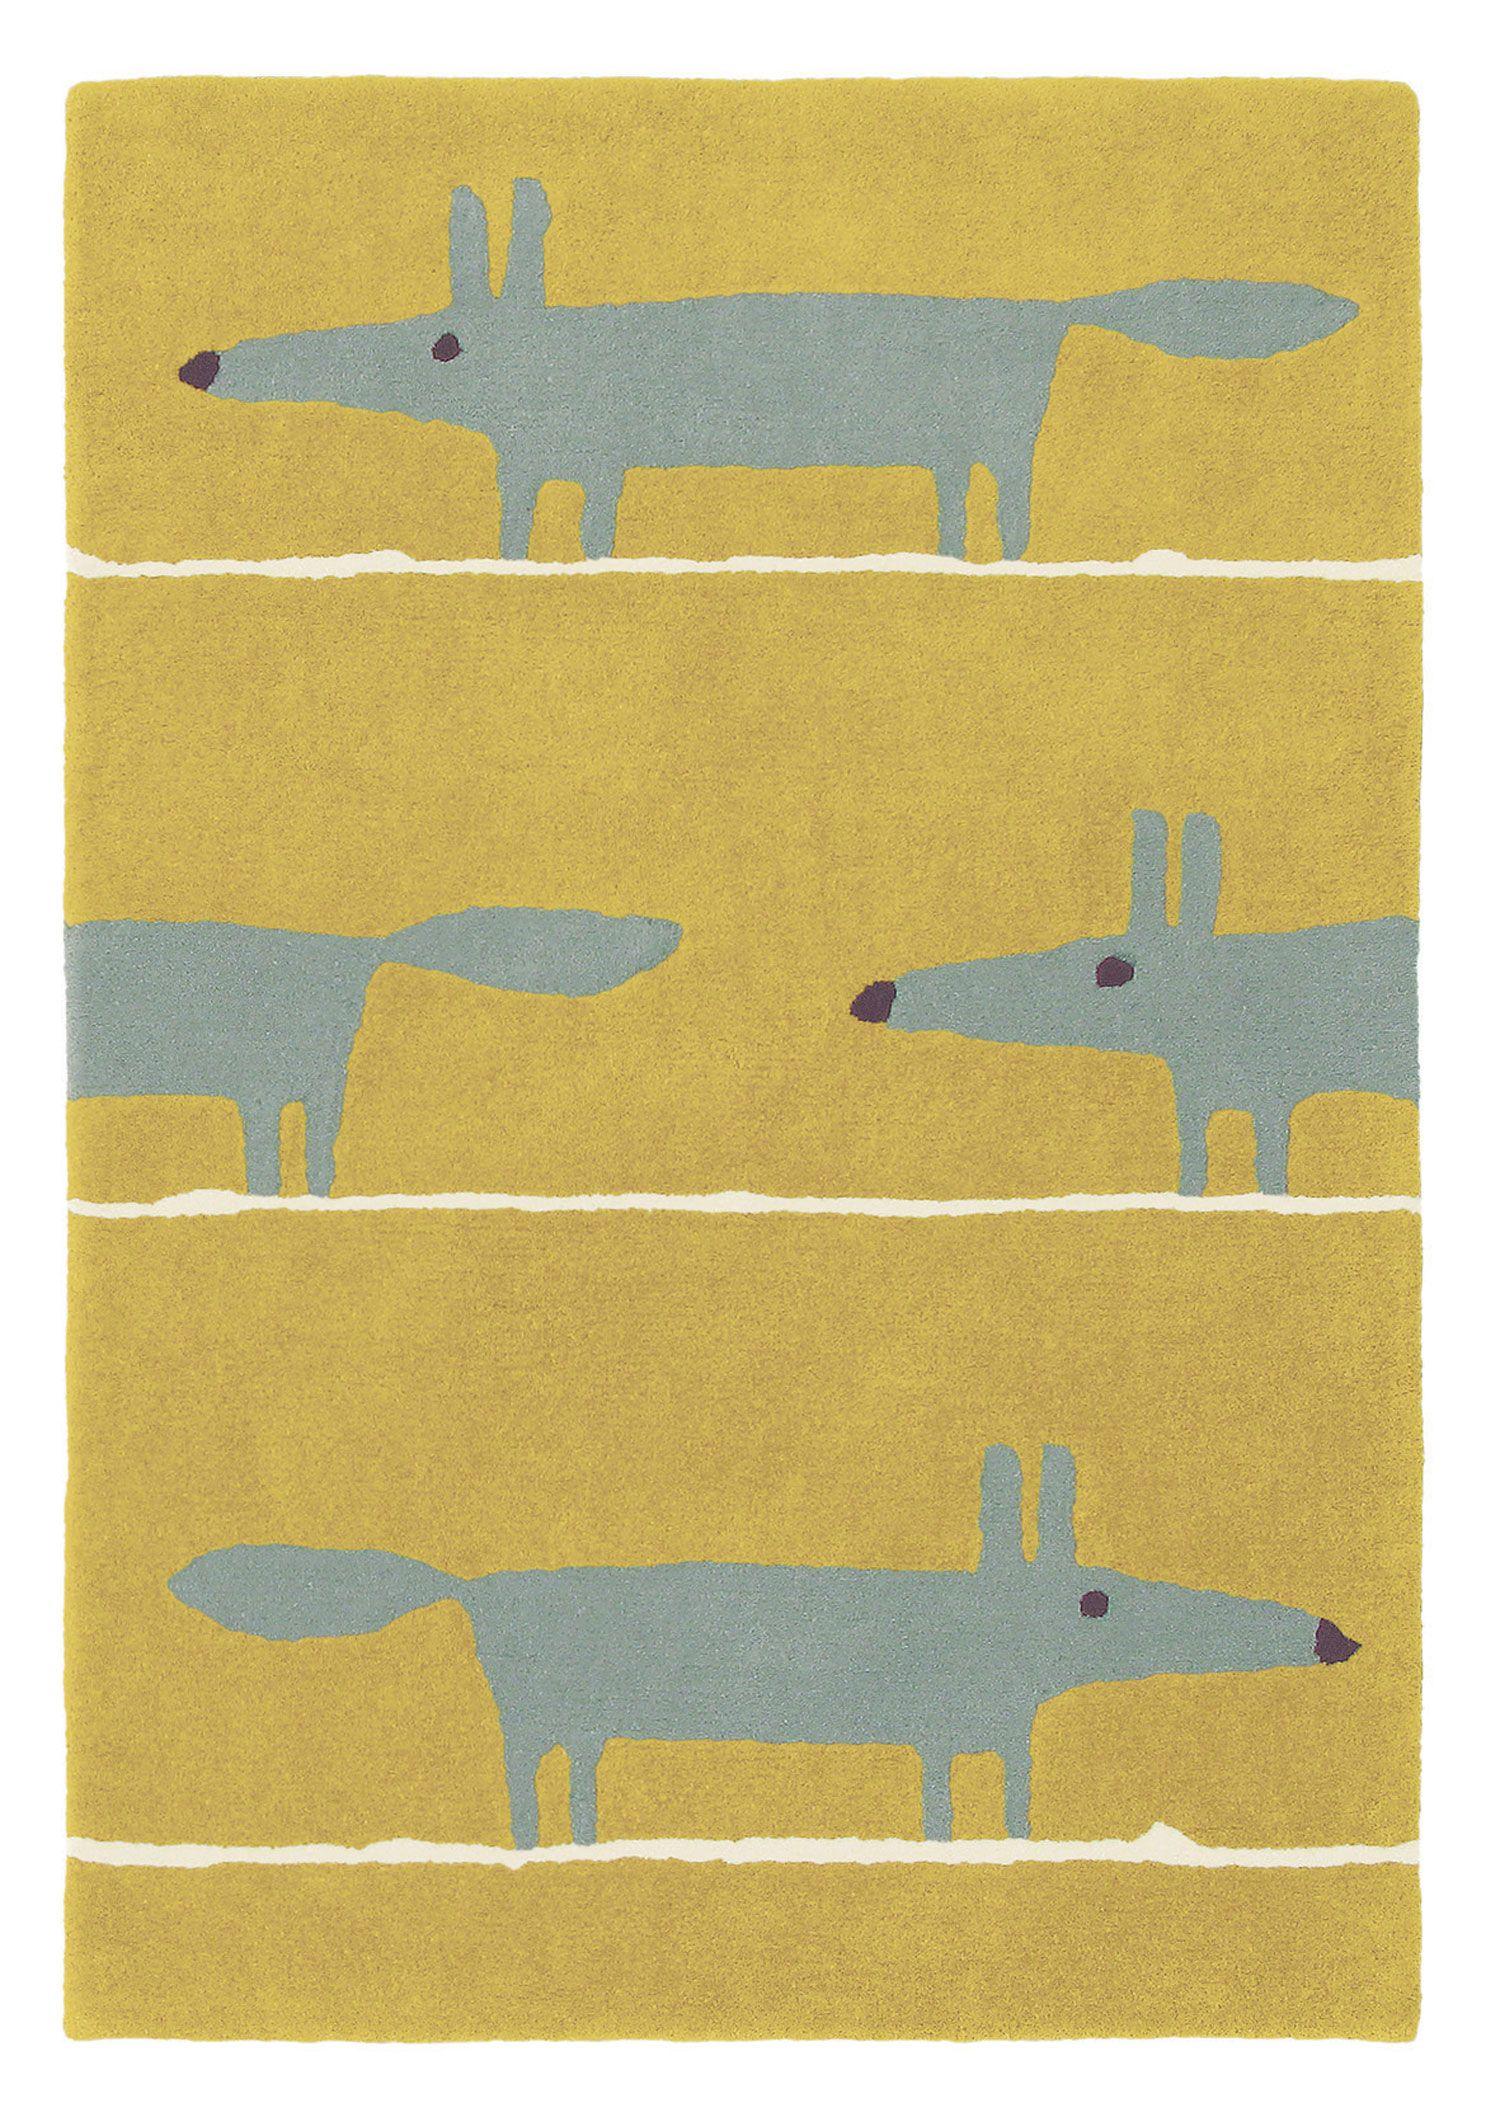 Scion mr fox mustard rug childus play pinterest mr fox scion